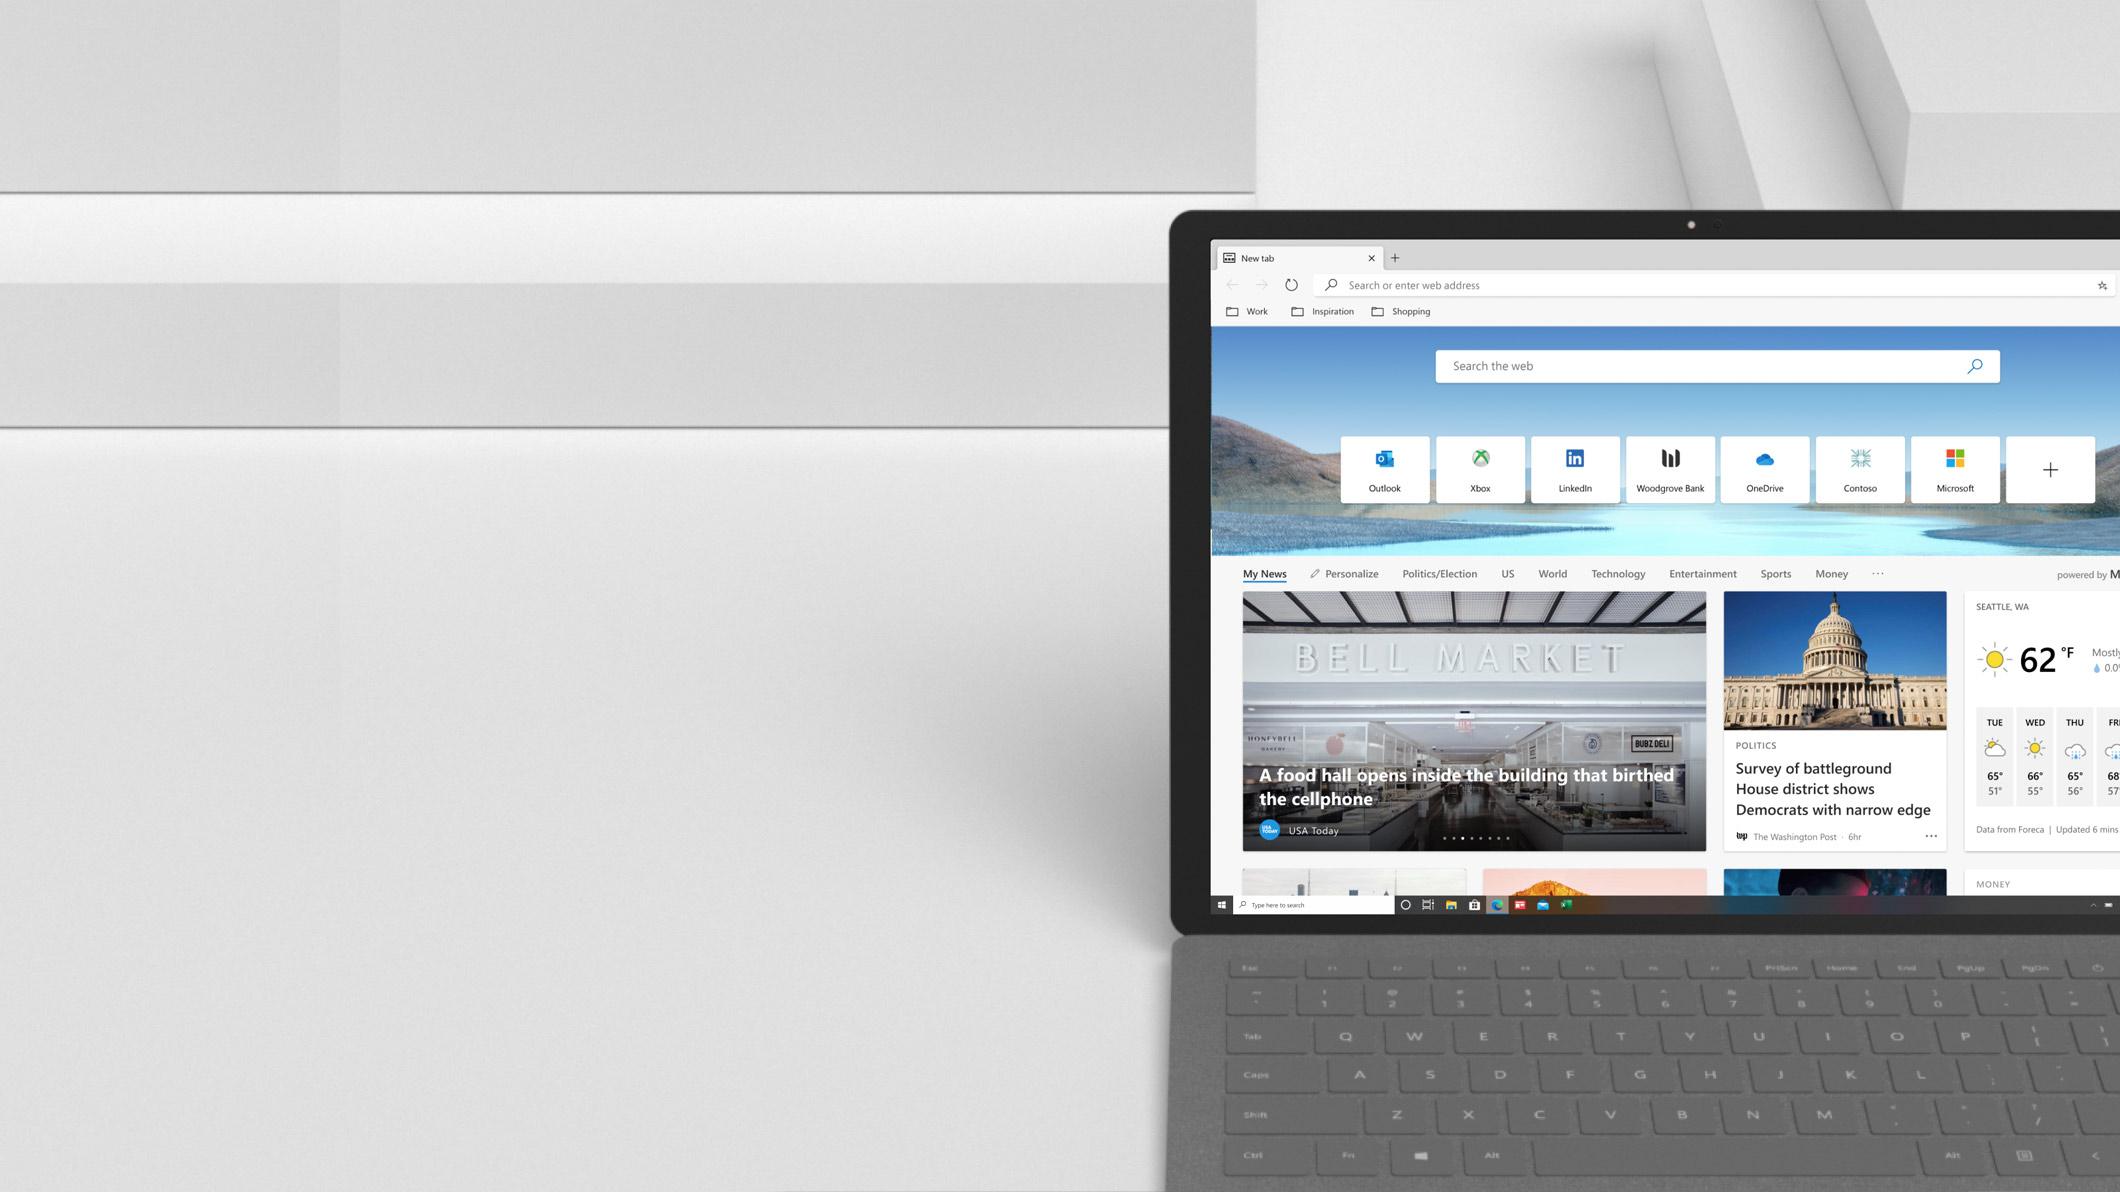 Domovská stránka portálu Microsoft News na obrazovce notebooku